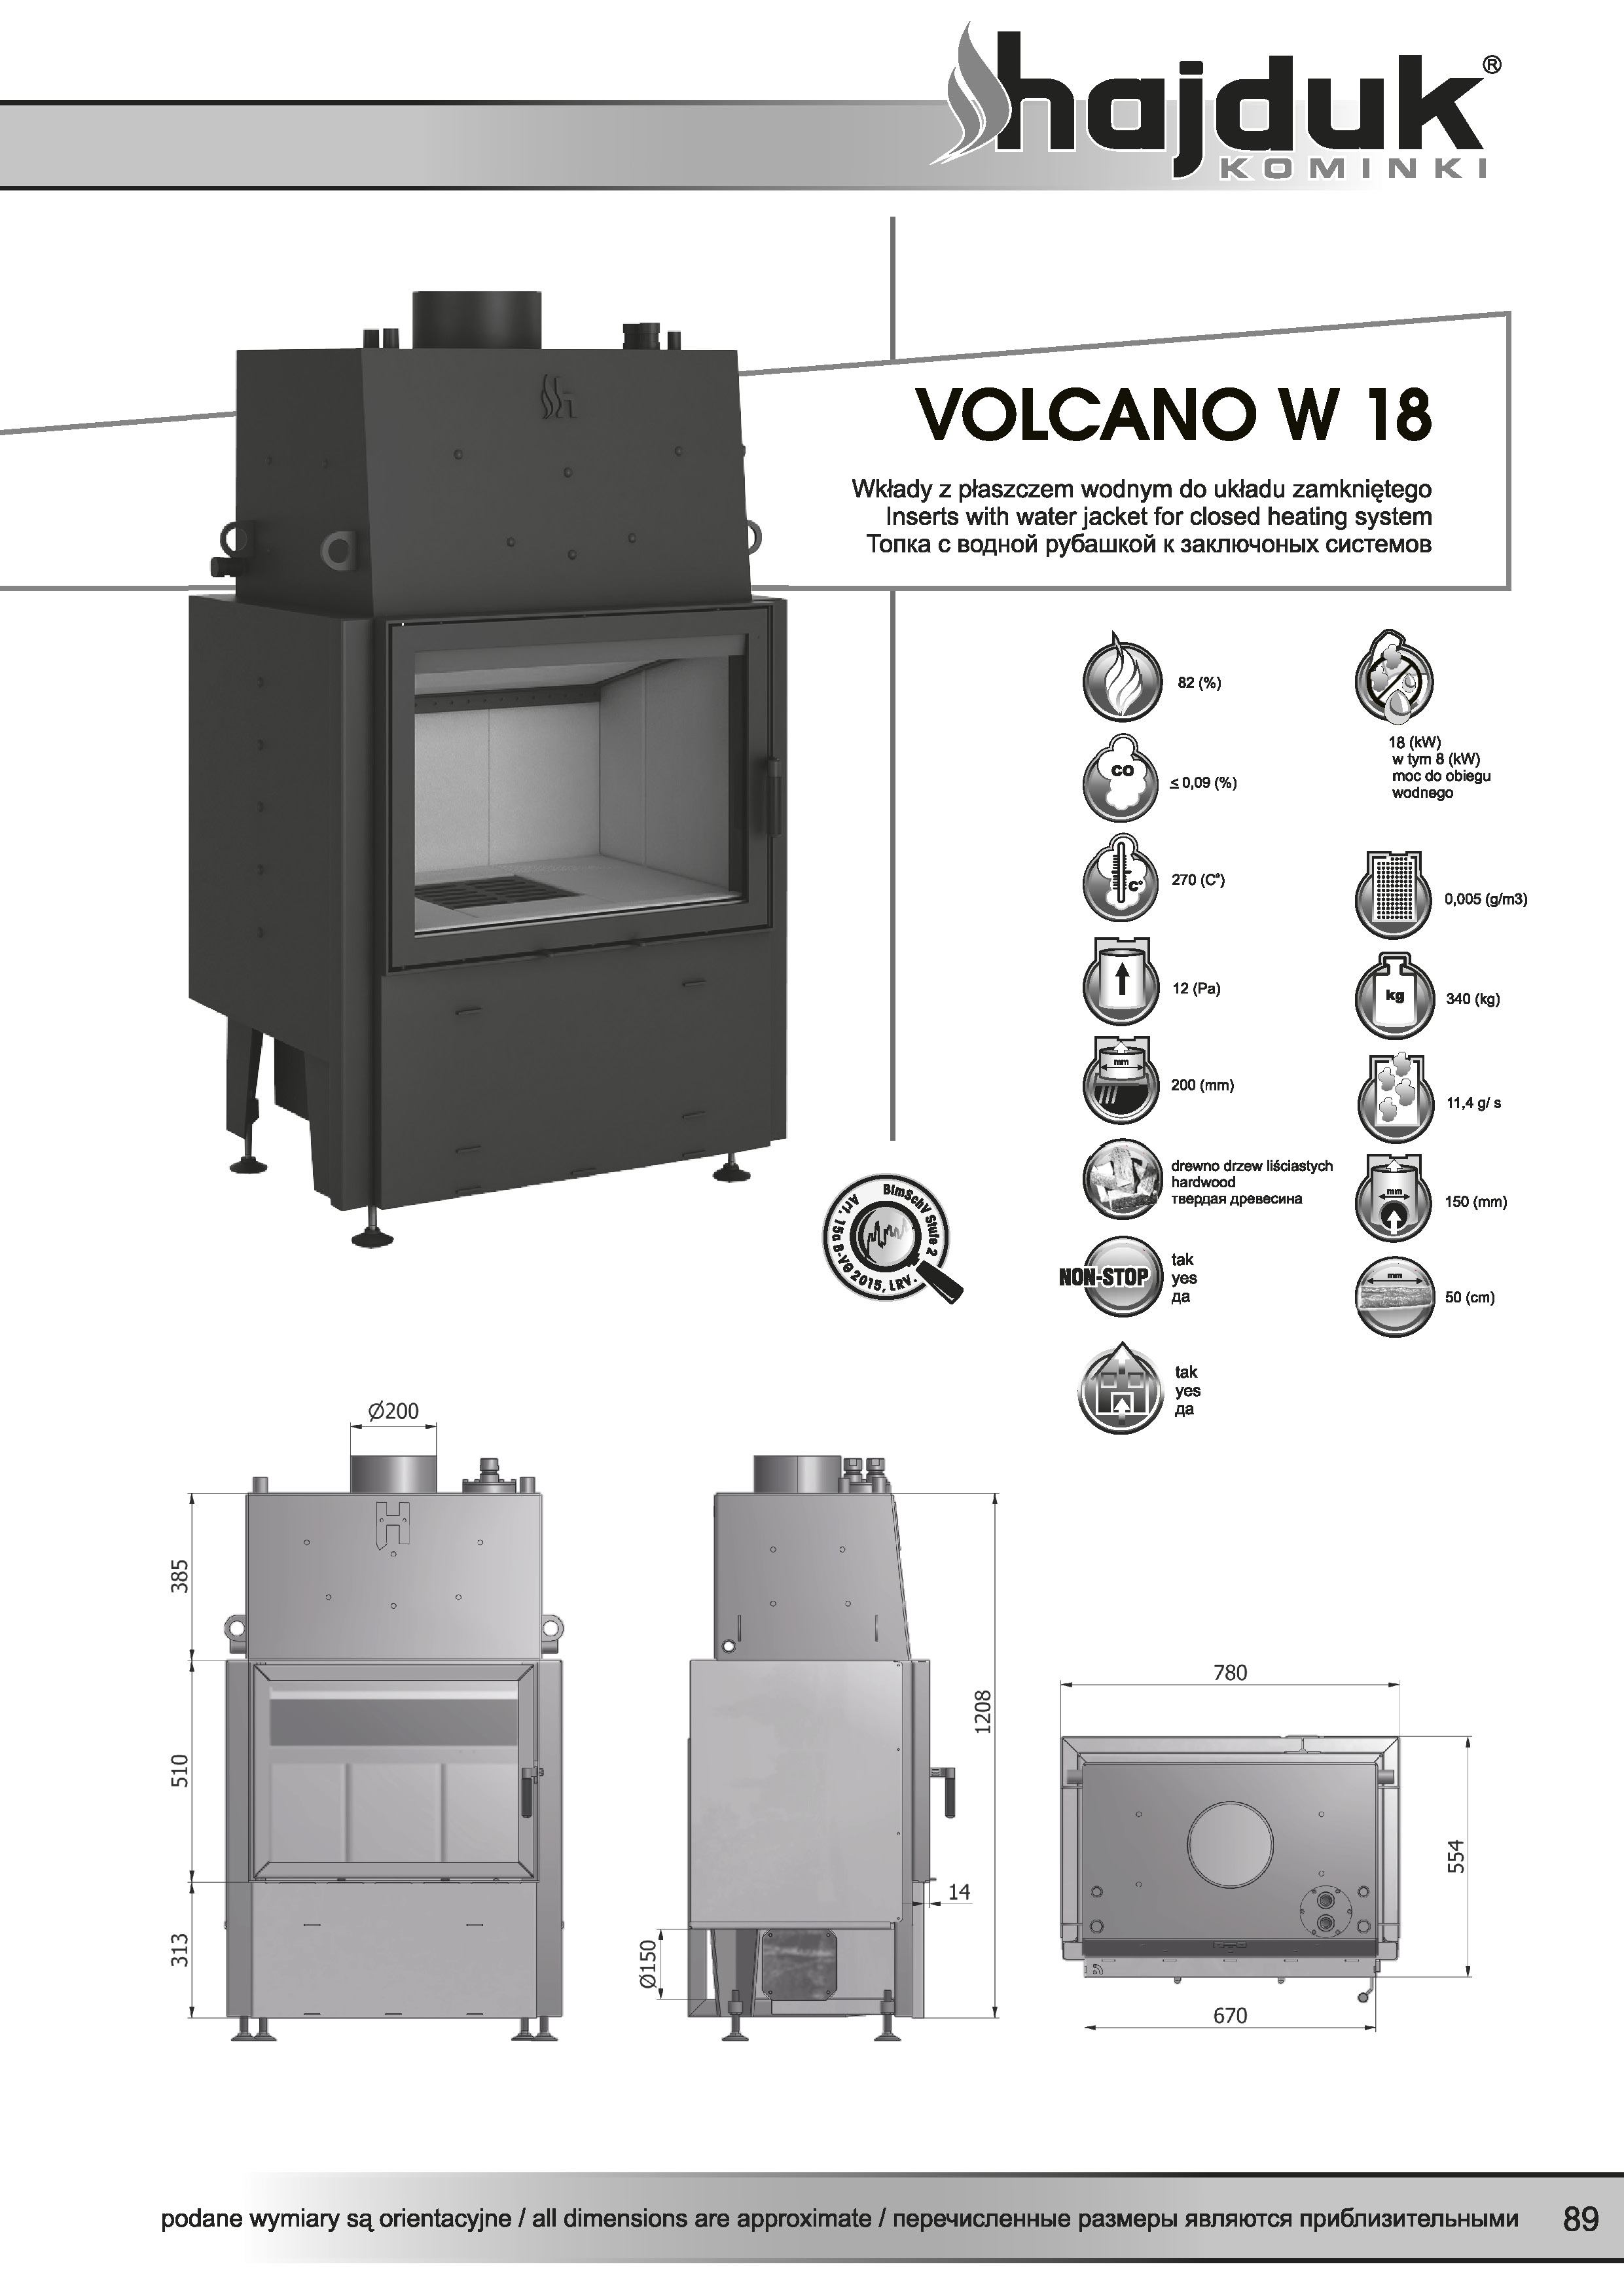 Volcano%20W 18%20 %20karta%20techniczna - Hajduk  Volcano W 18